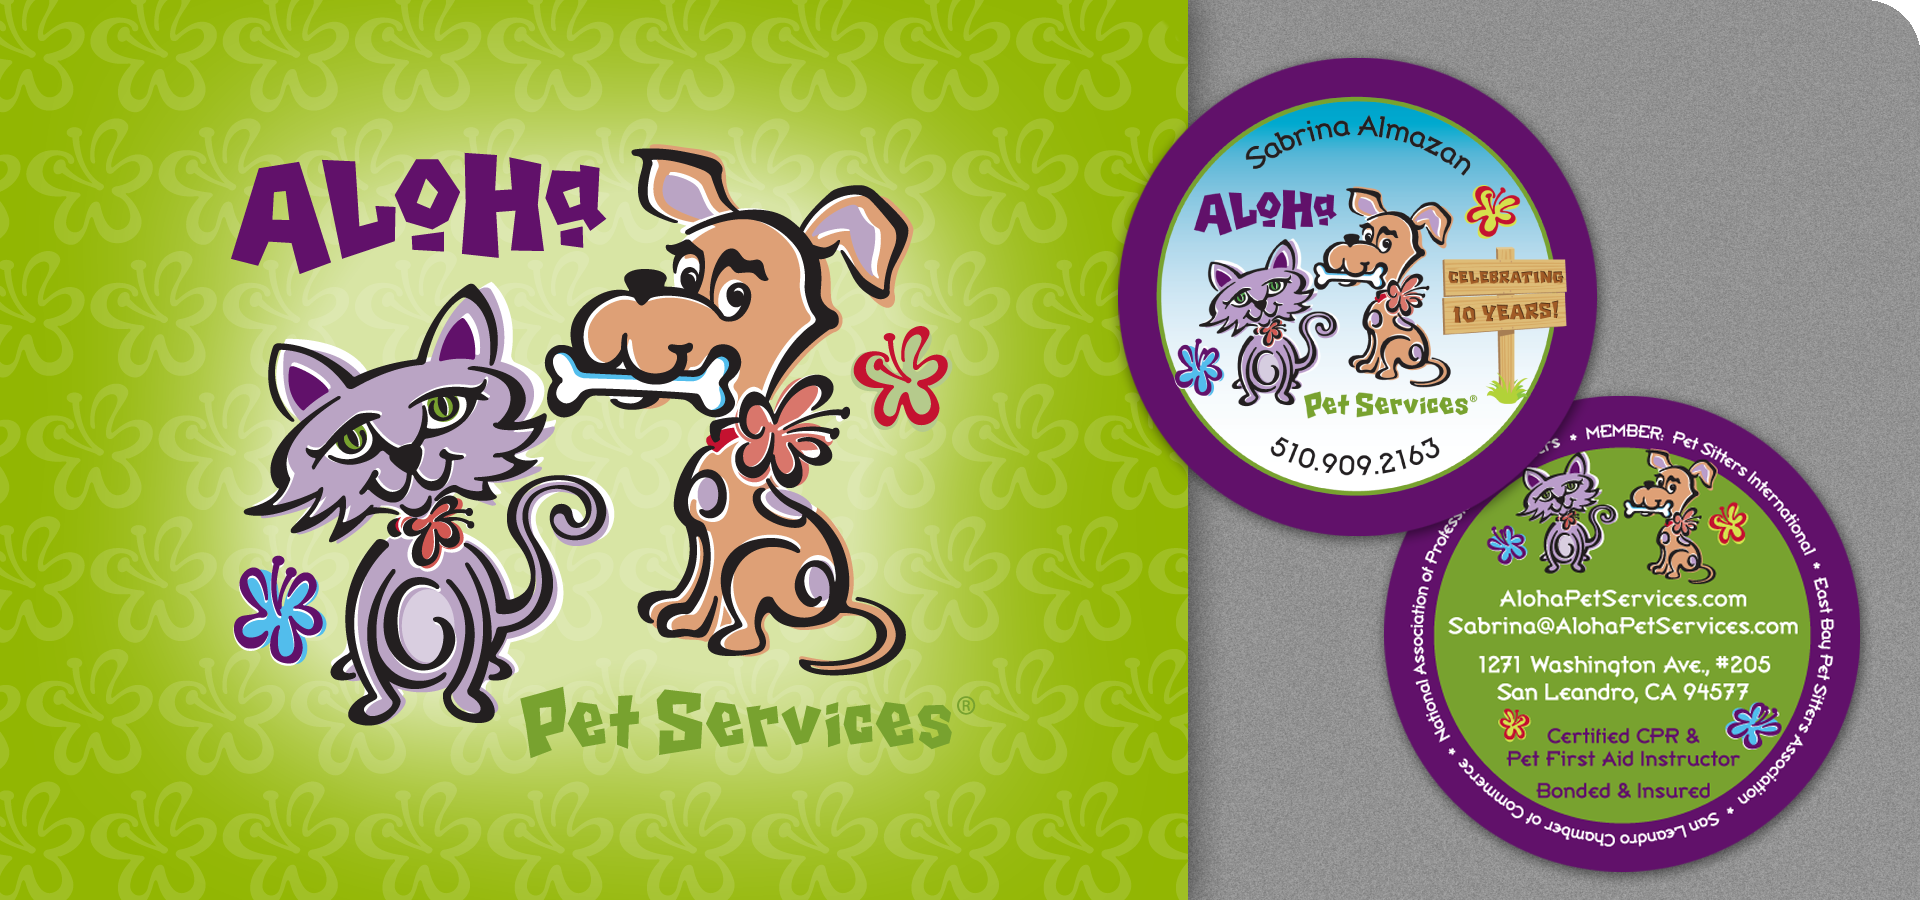 Aloha Pet Services